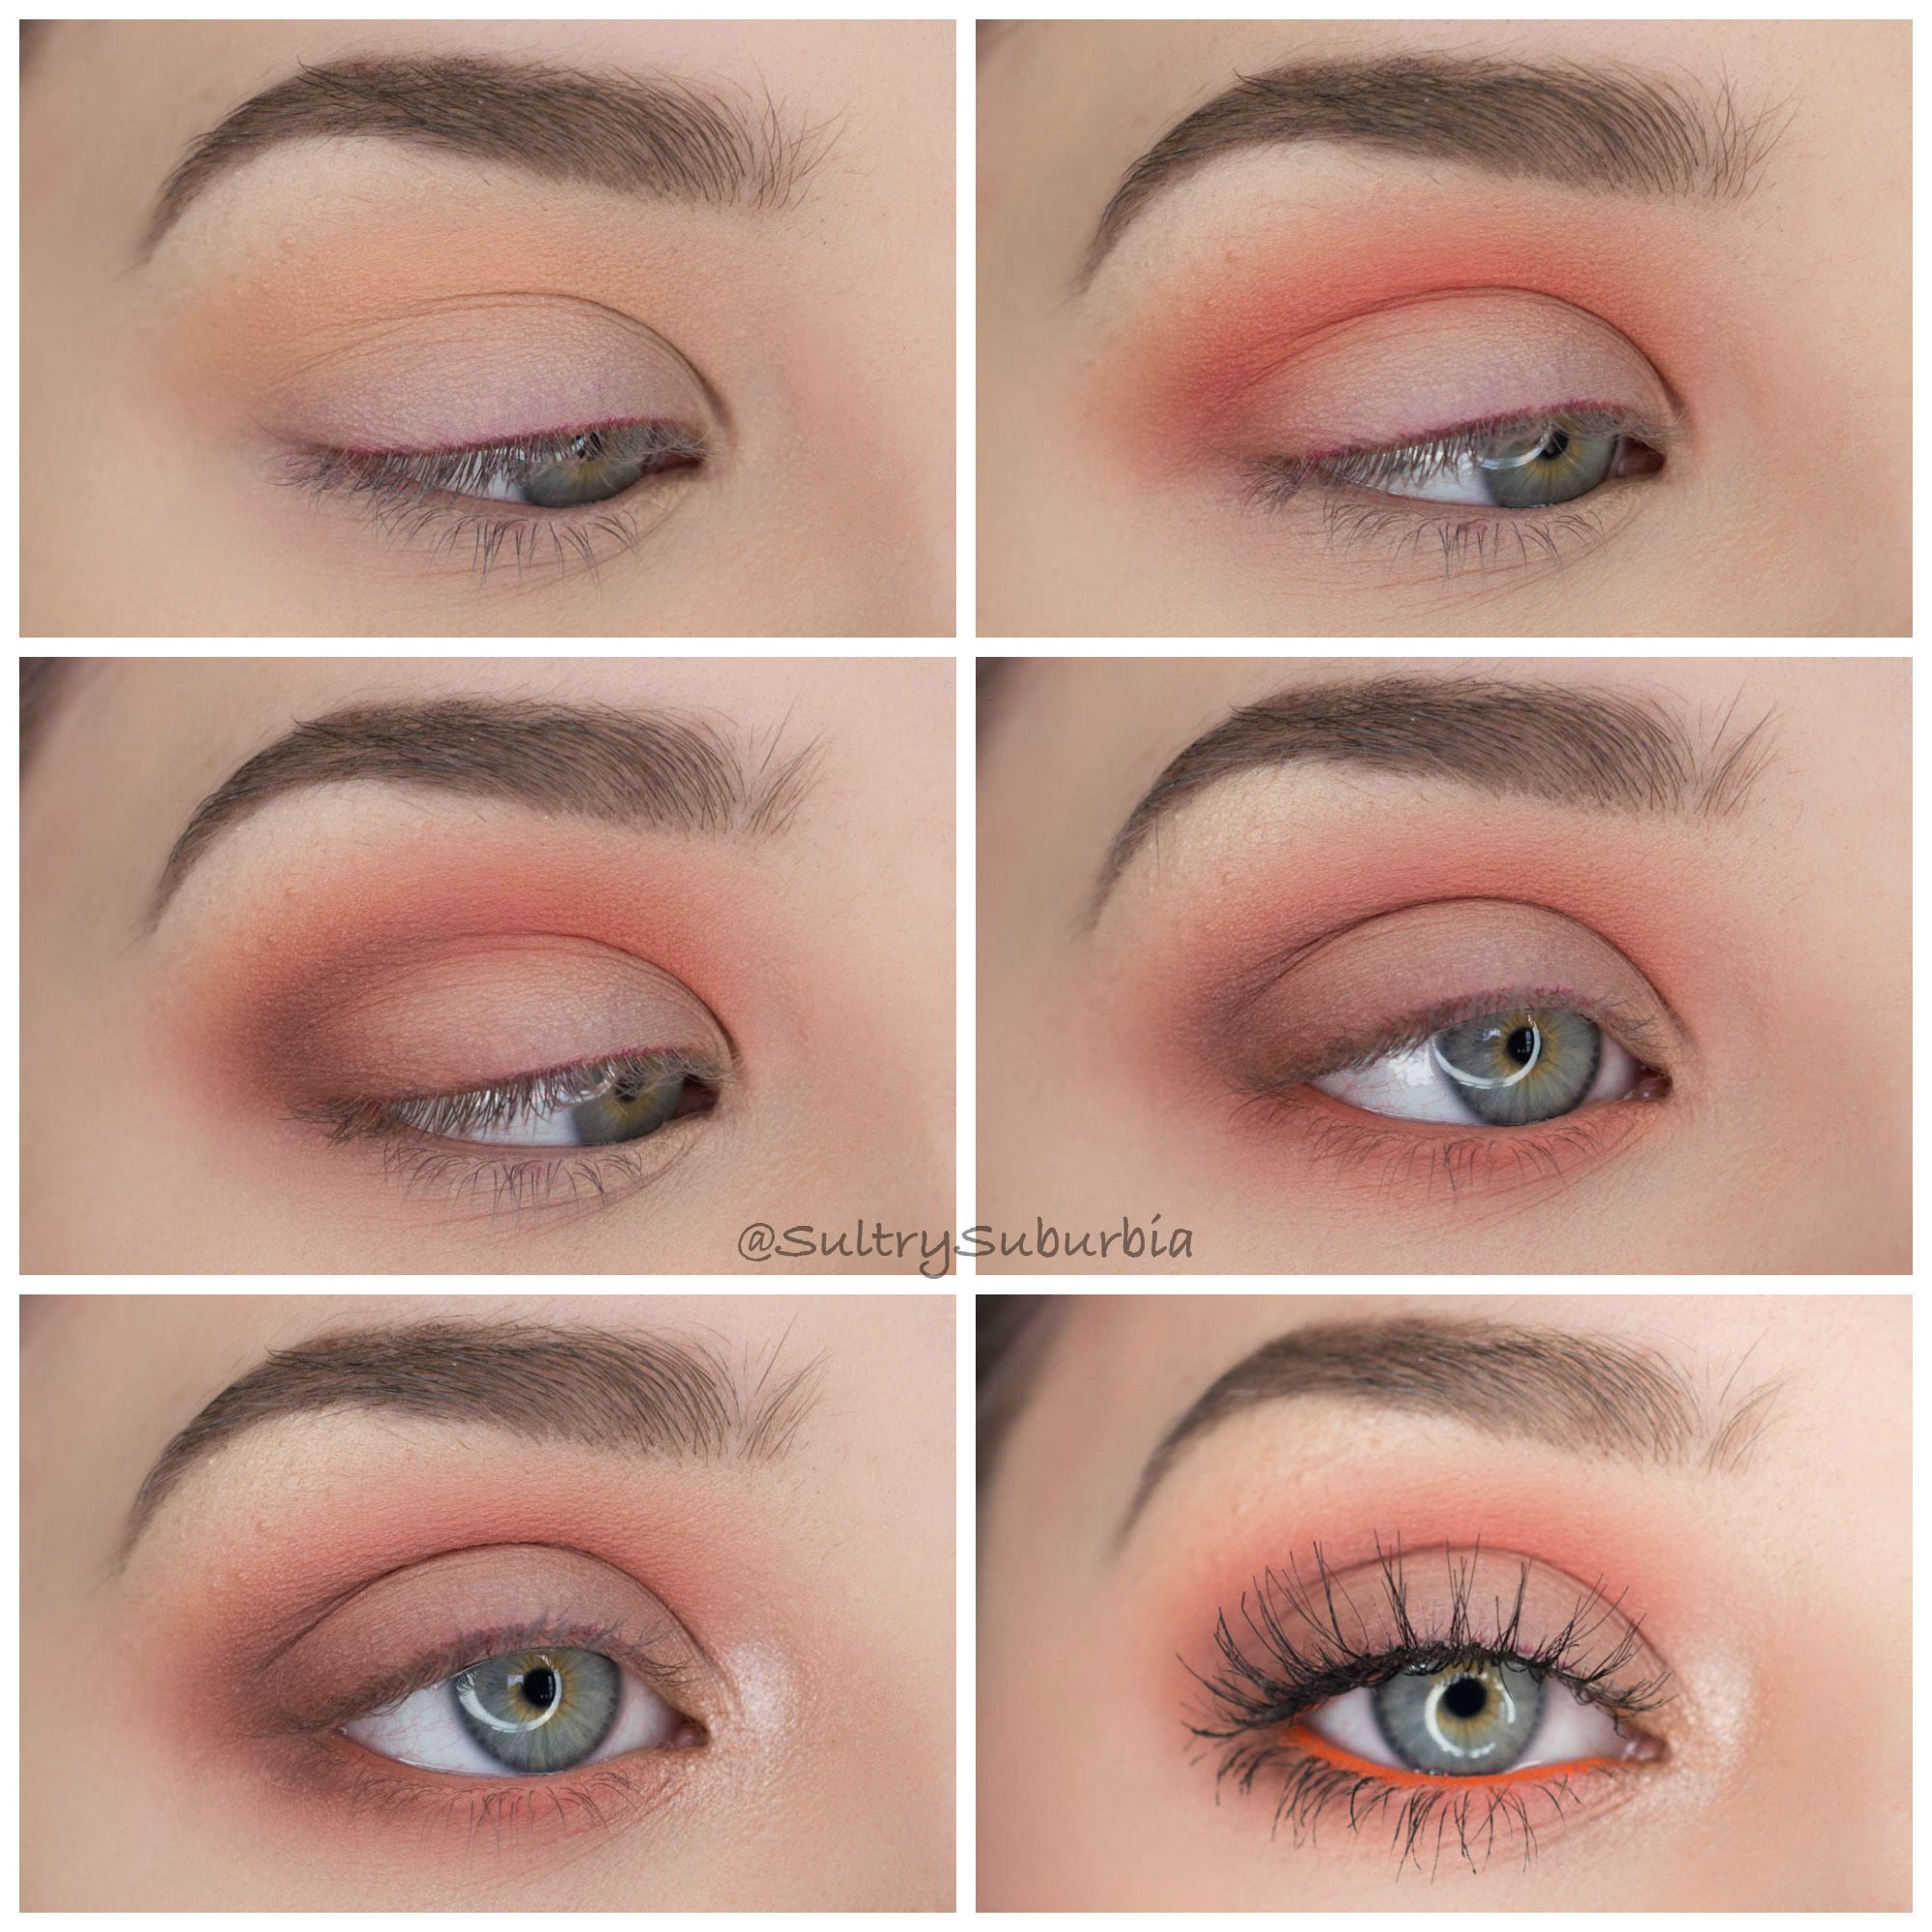 Step By Step Simple & Pretty Eyeshadow Tutorial  Makeup And Beauty   Pinterest  Eyeshadow Tutorials, Simple Eyeshadow Tutorial And Makeup  Tutorials